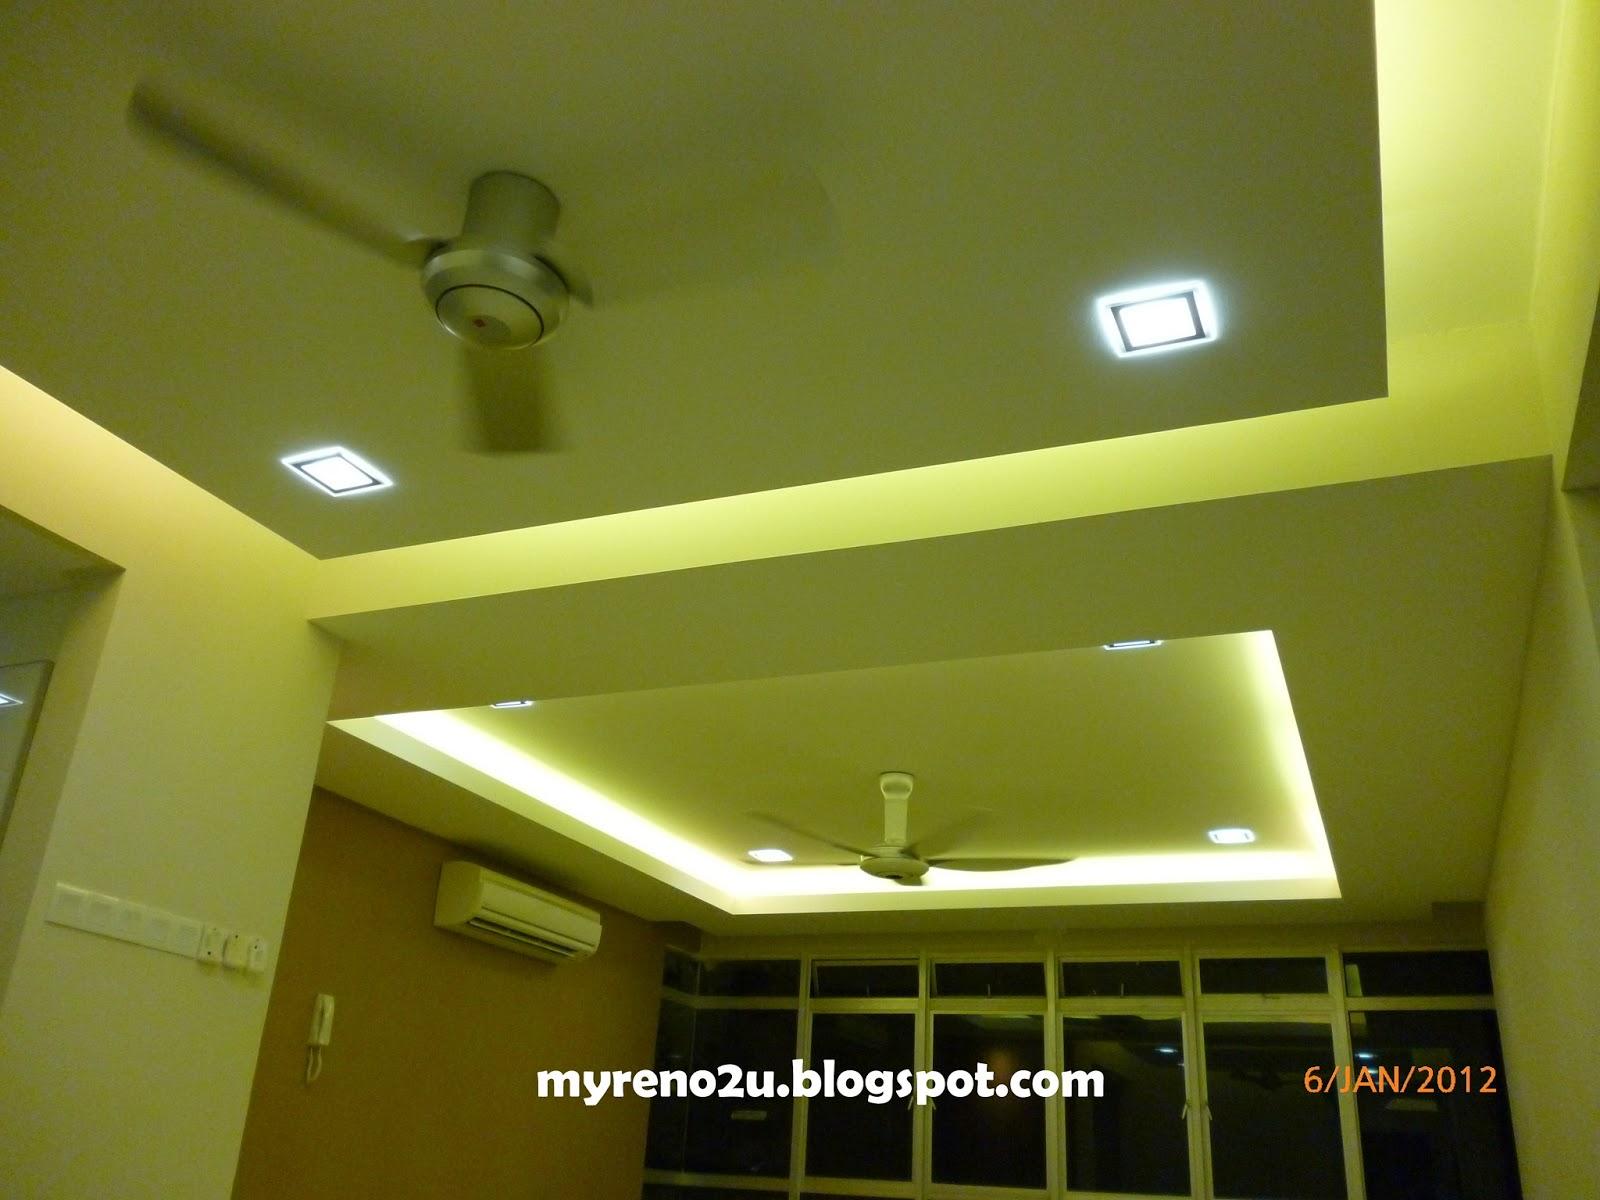 Schematic Wiring Diagram Of A House Allen Bradley Diagrams Motor Starter Plaster Ceiling Design Shah Alam | Myreno2u